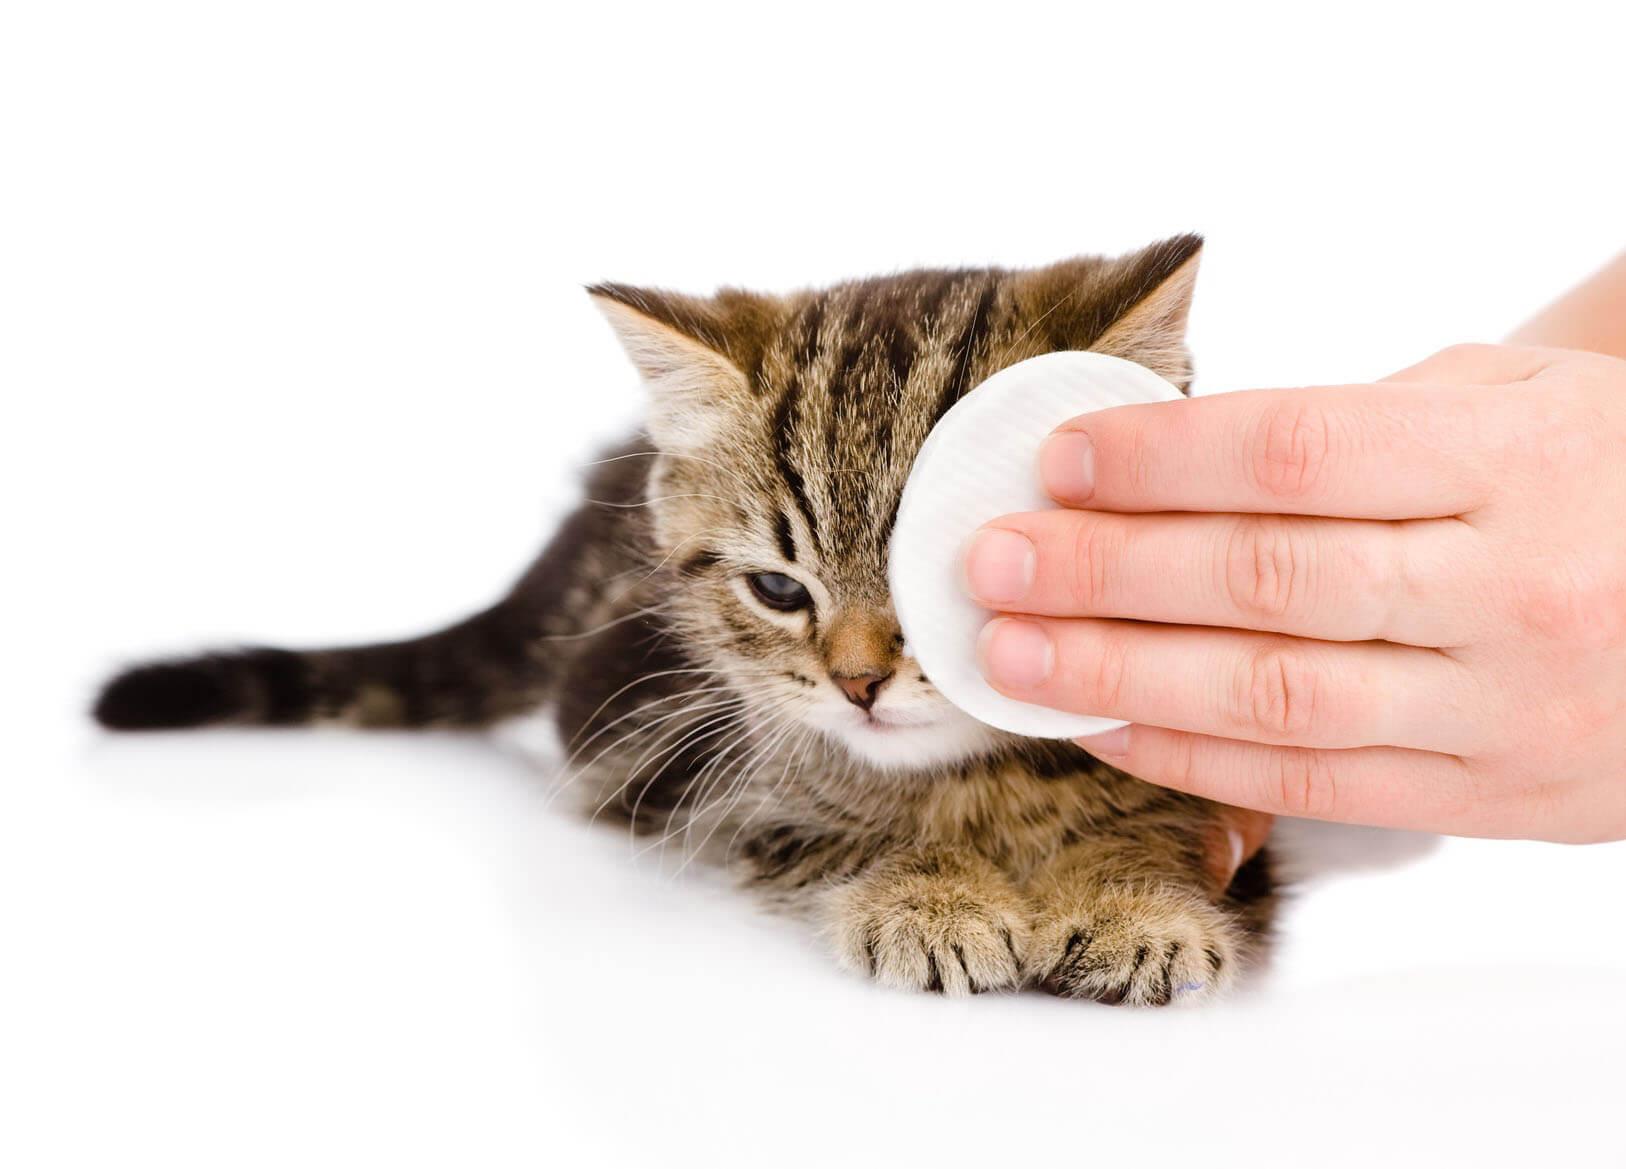 Протираем глаза котёнку ватным тампоном